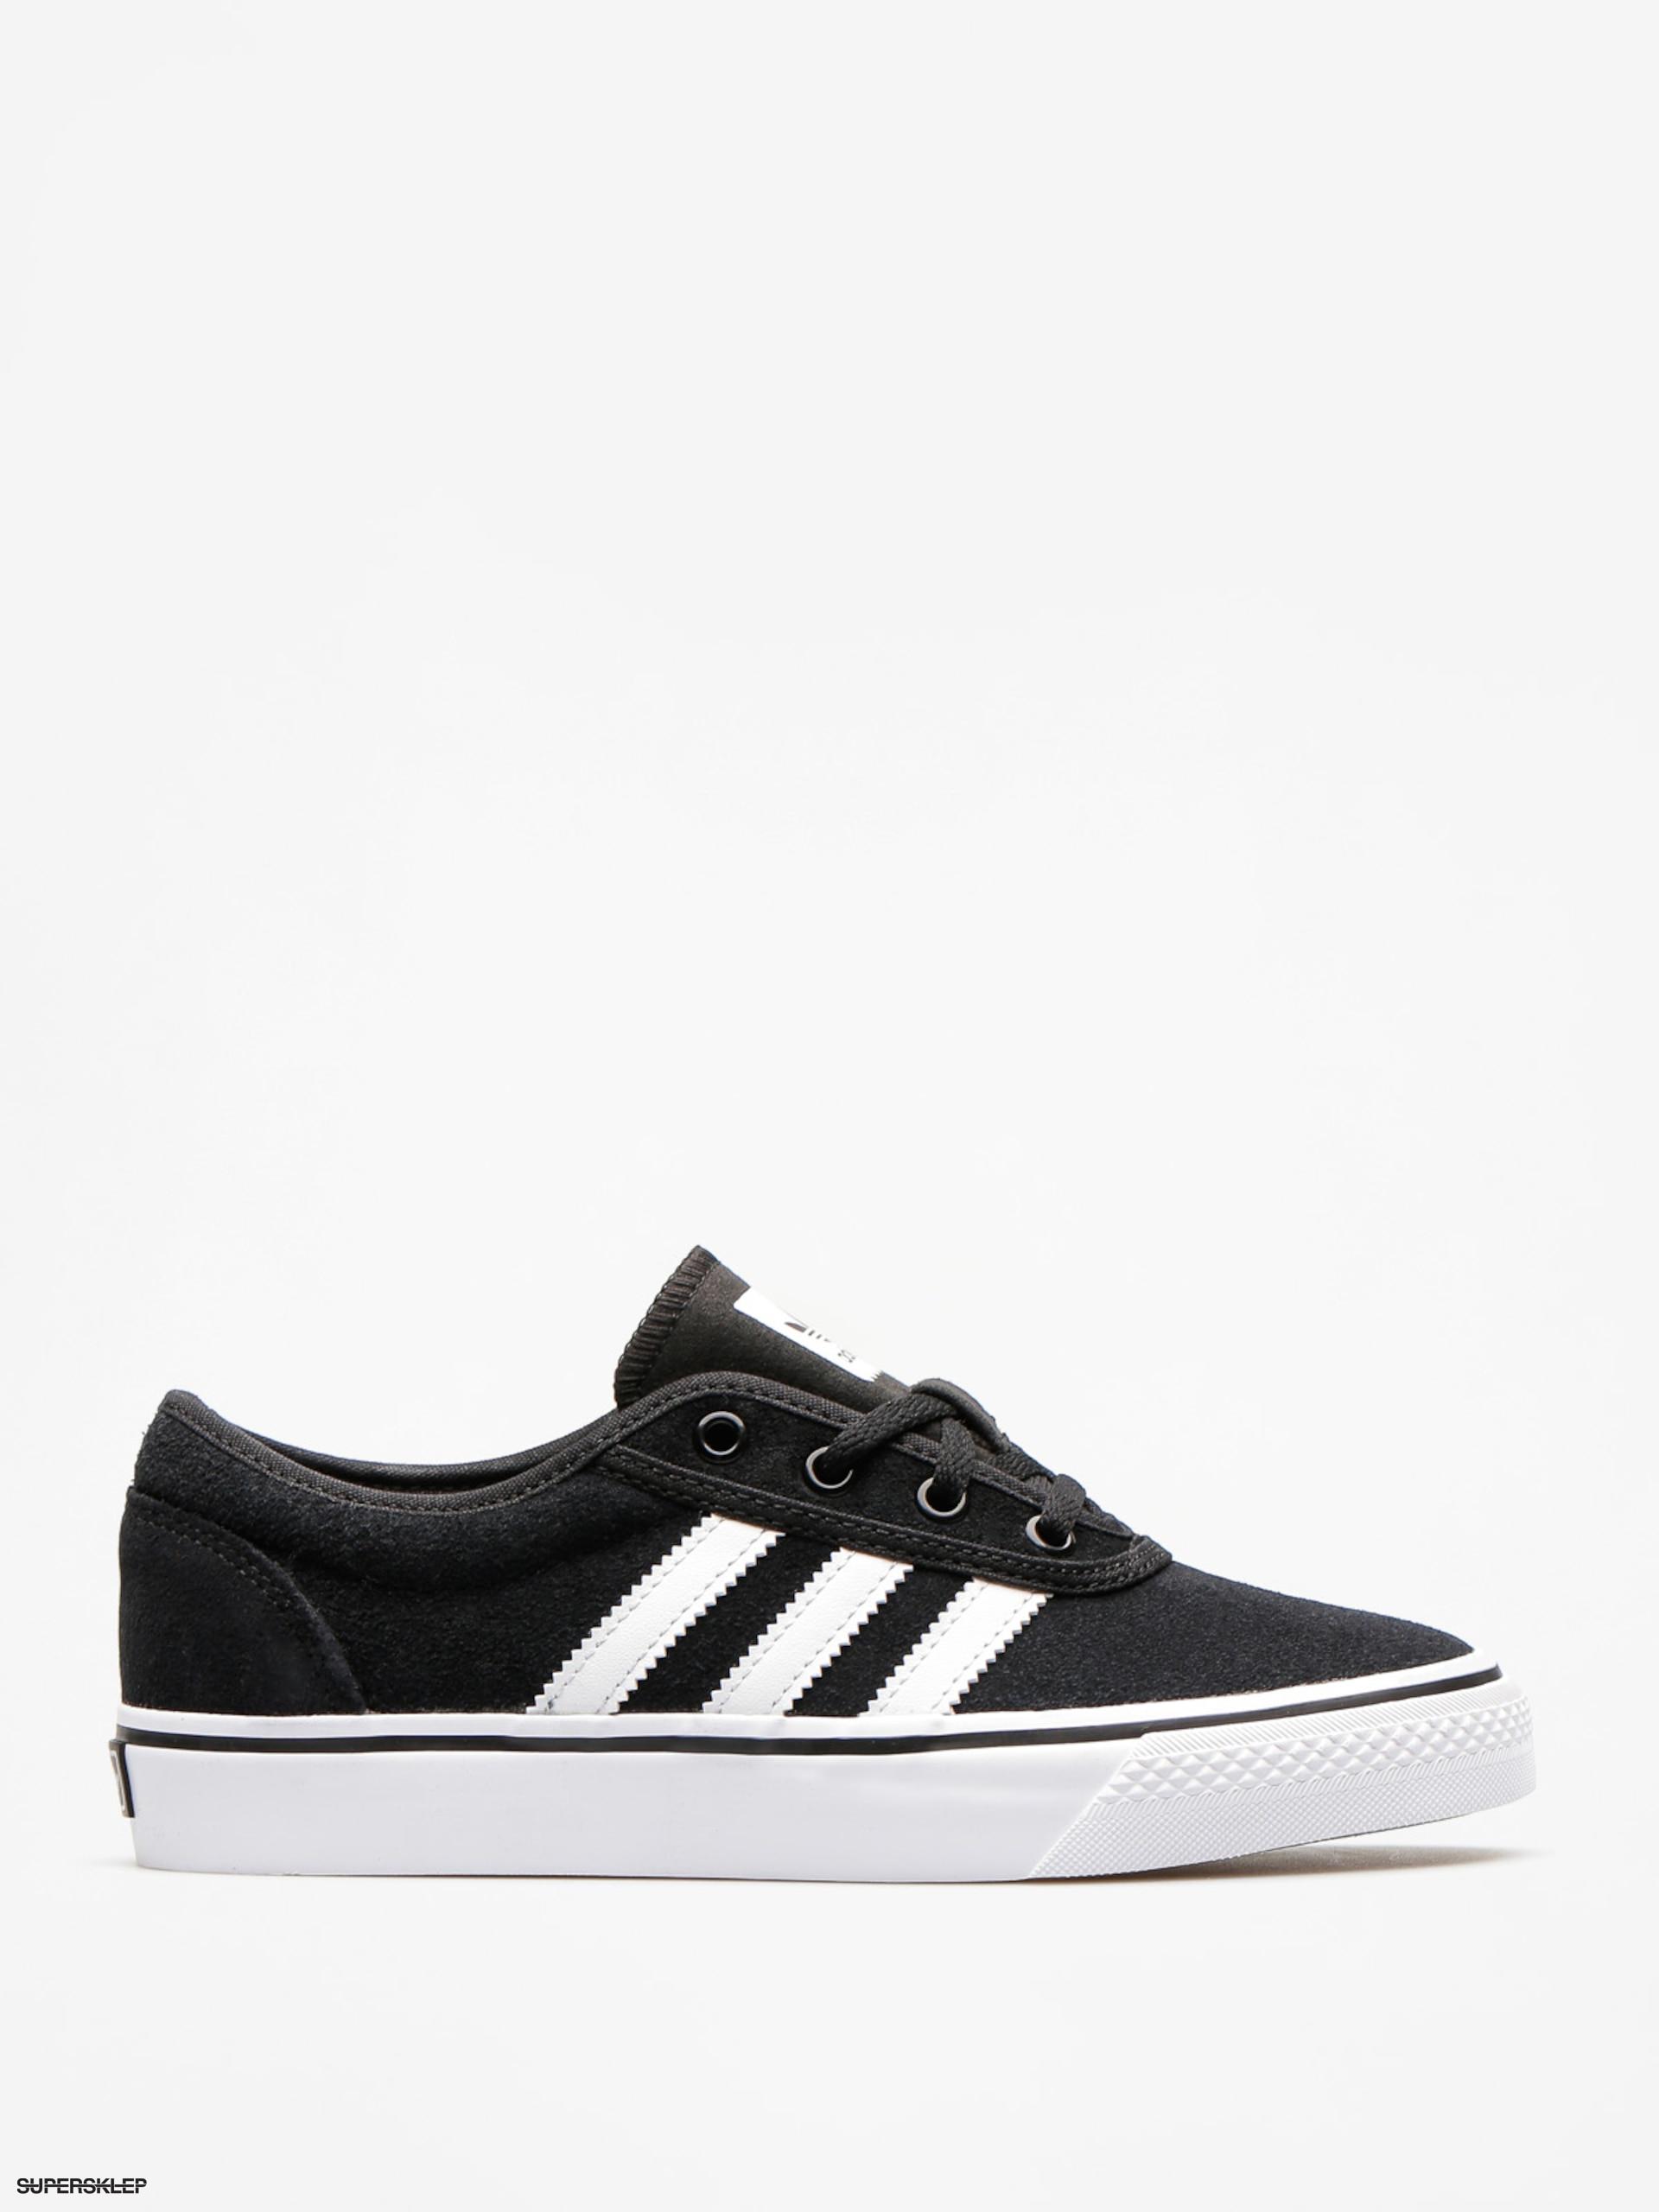 4b57e8c74e899 Buty adidas Adi Ease (cblack/ftwwht/cblack)